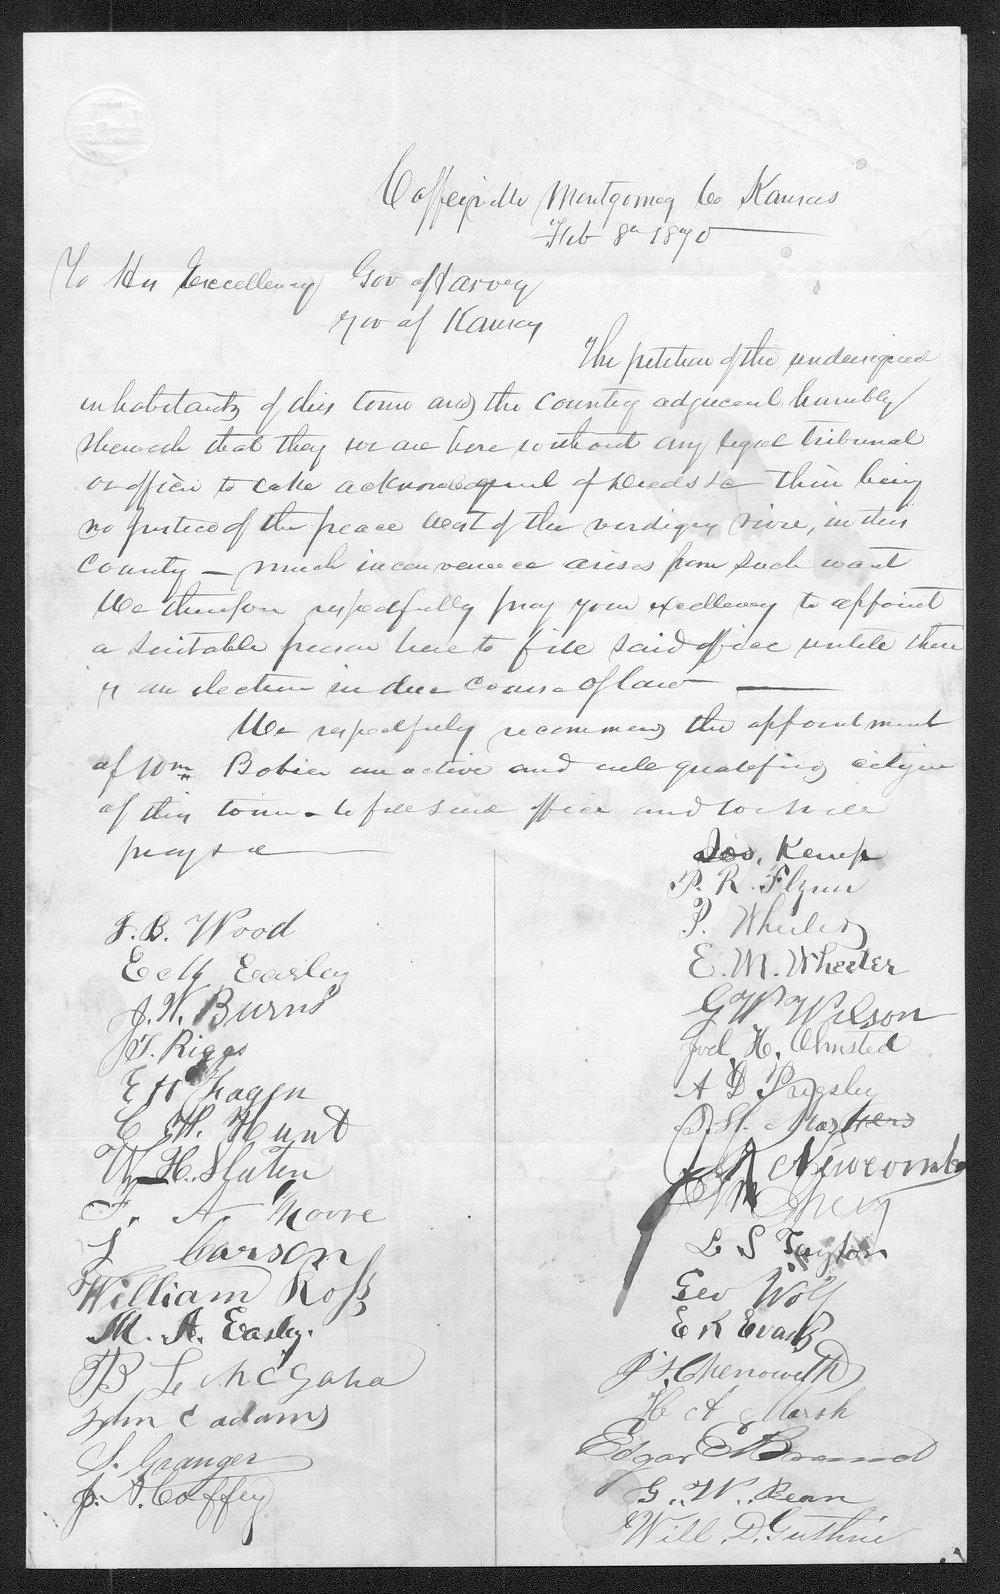 Montgomery County organization records - 11